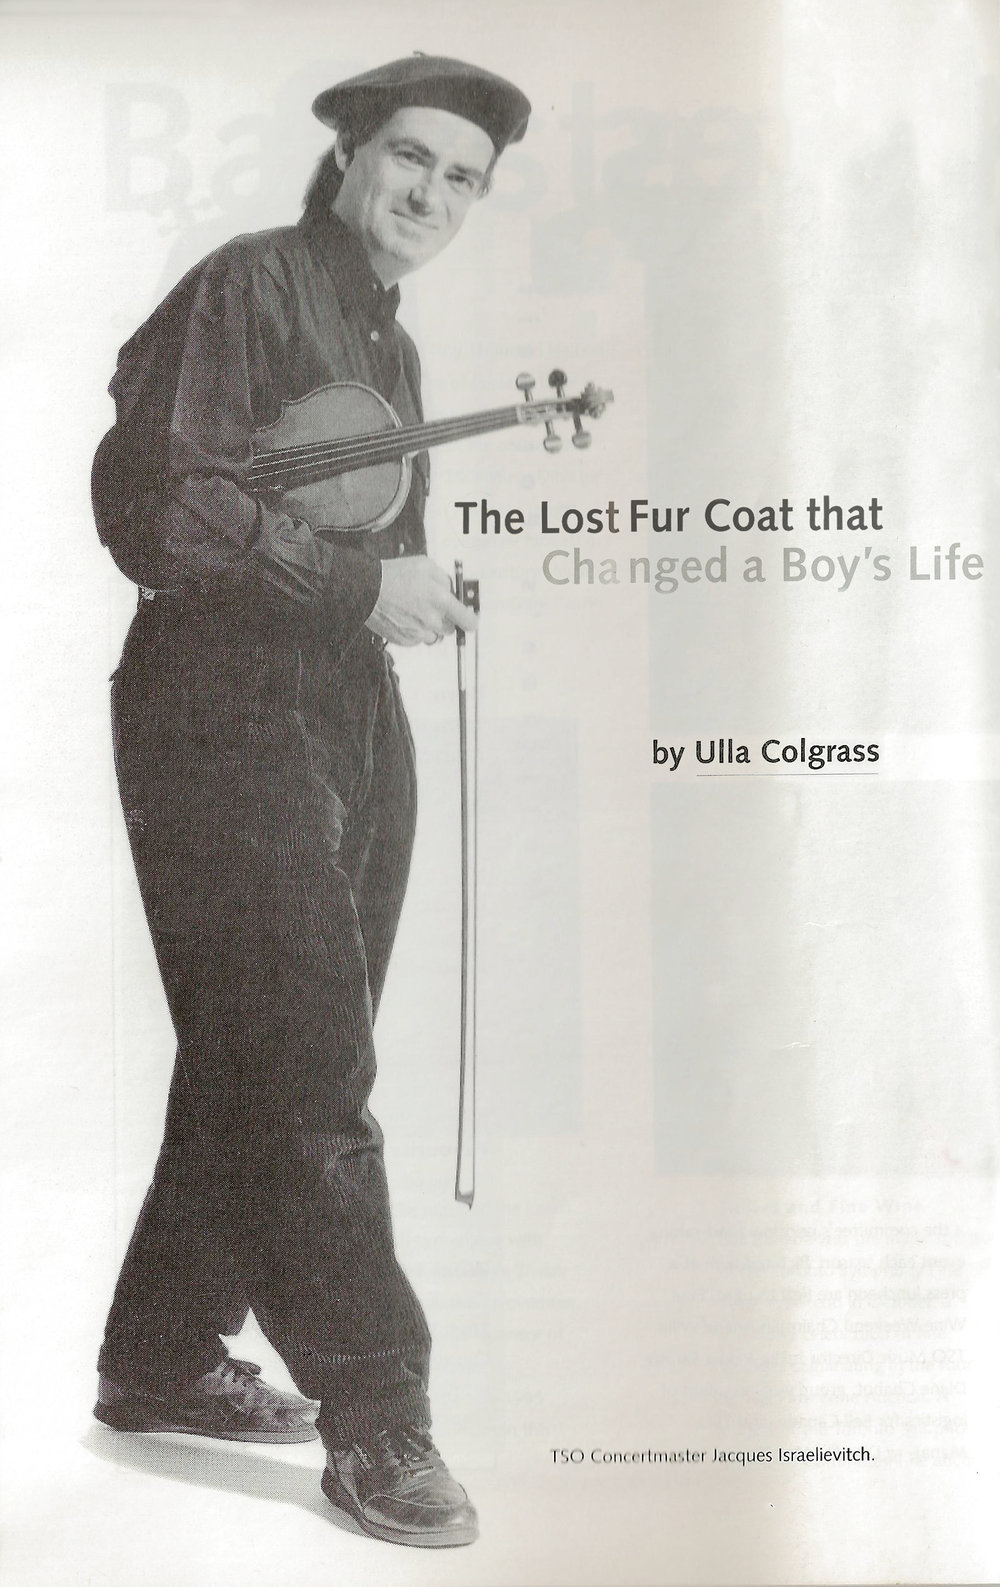 fur coat story jan 1995-1-2.jpg